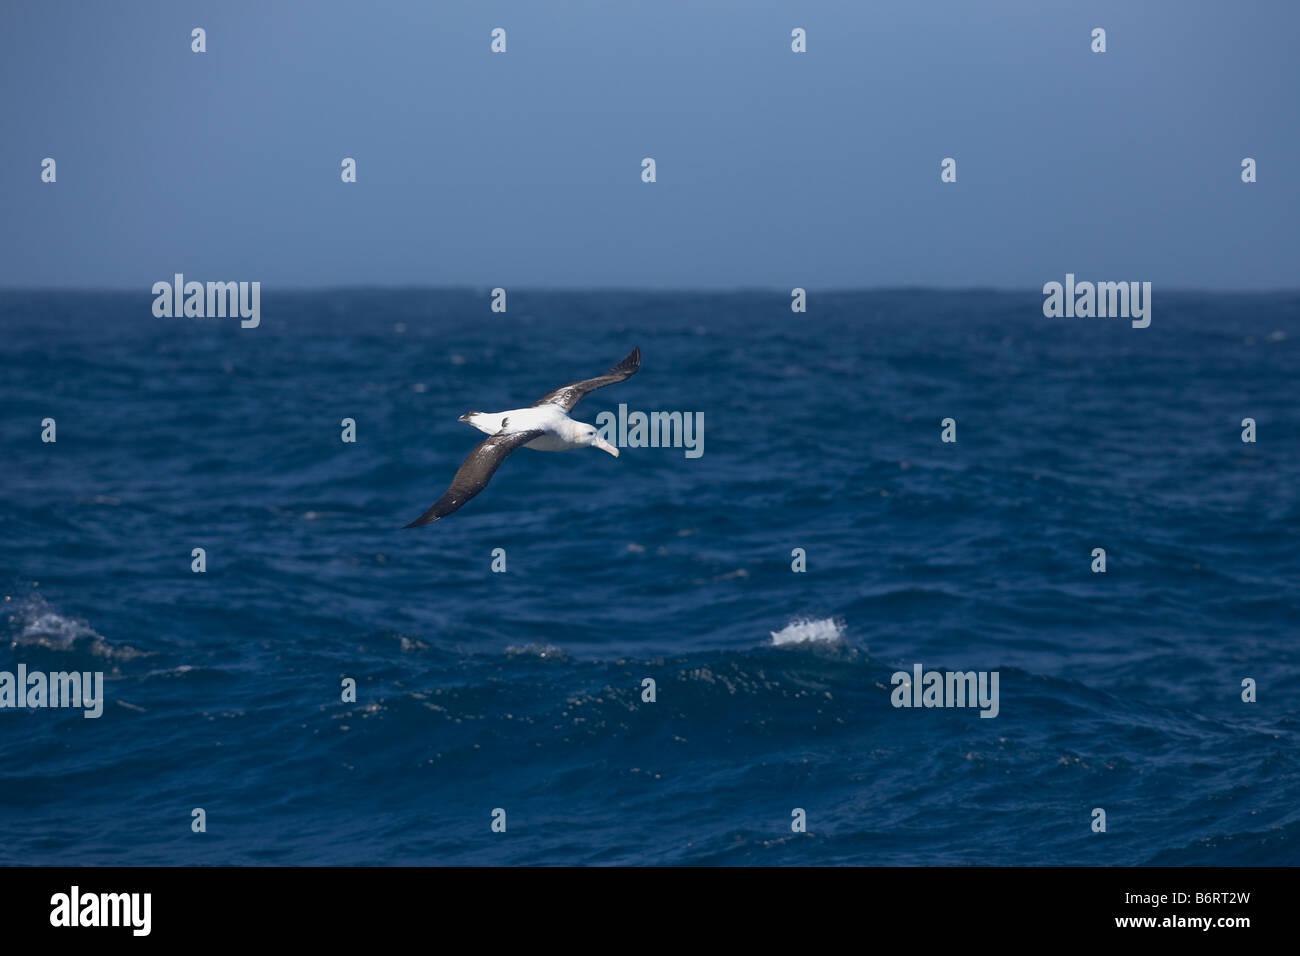 Wandering Albatross Diomedea exulans Drake Passage Southern Ocean Antarctica - Stock Image